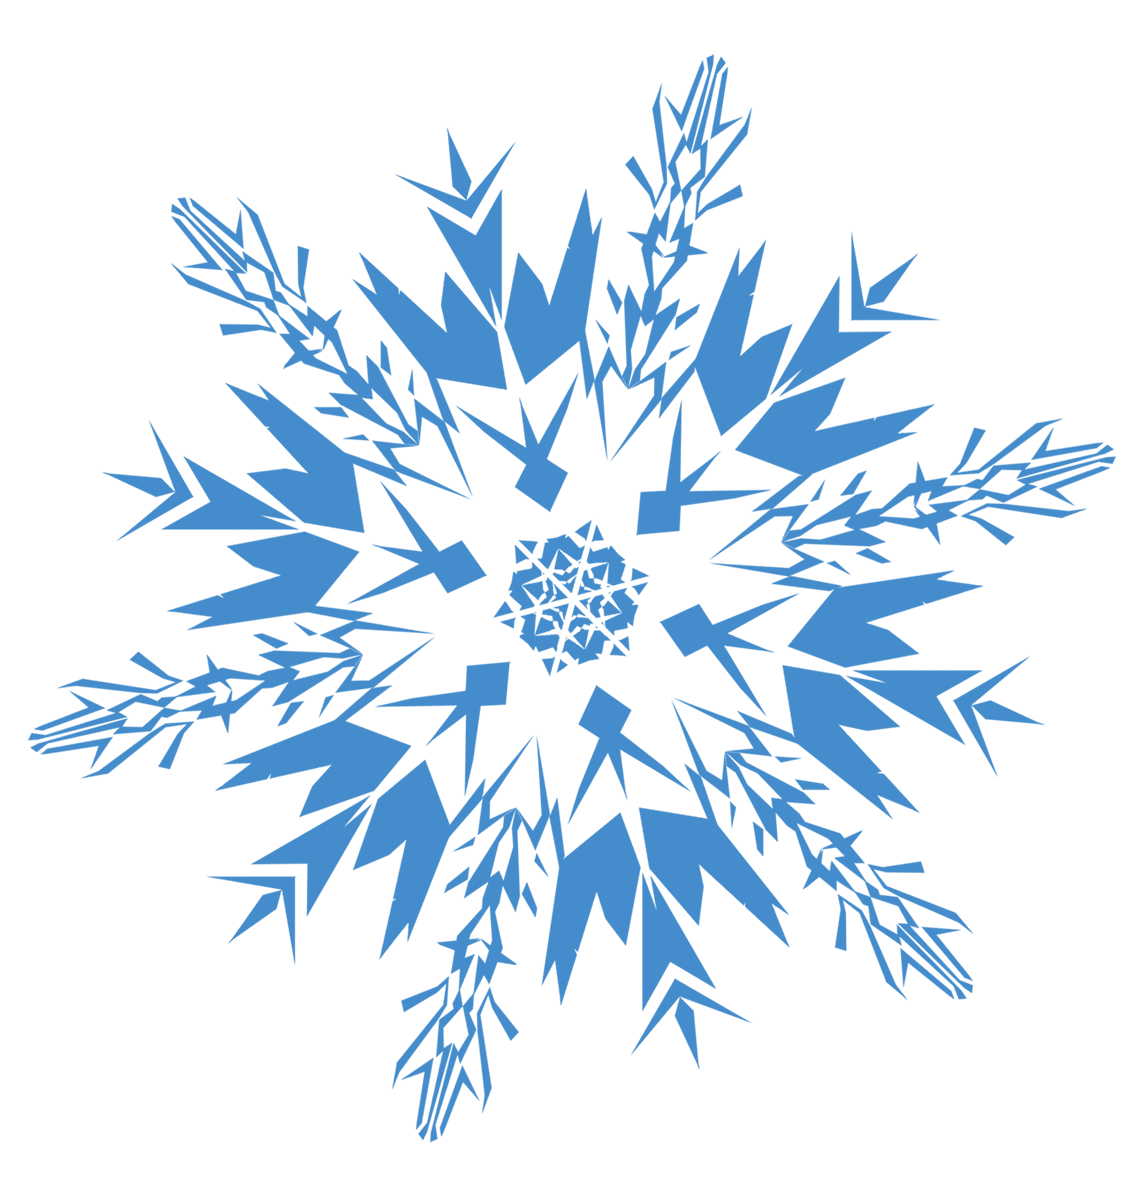 Blue christmas snowflake clipart free image transparent download Frozen Snowflakes | Free download best Frozen Snowflakes on ... image transparent download